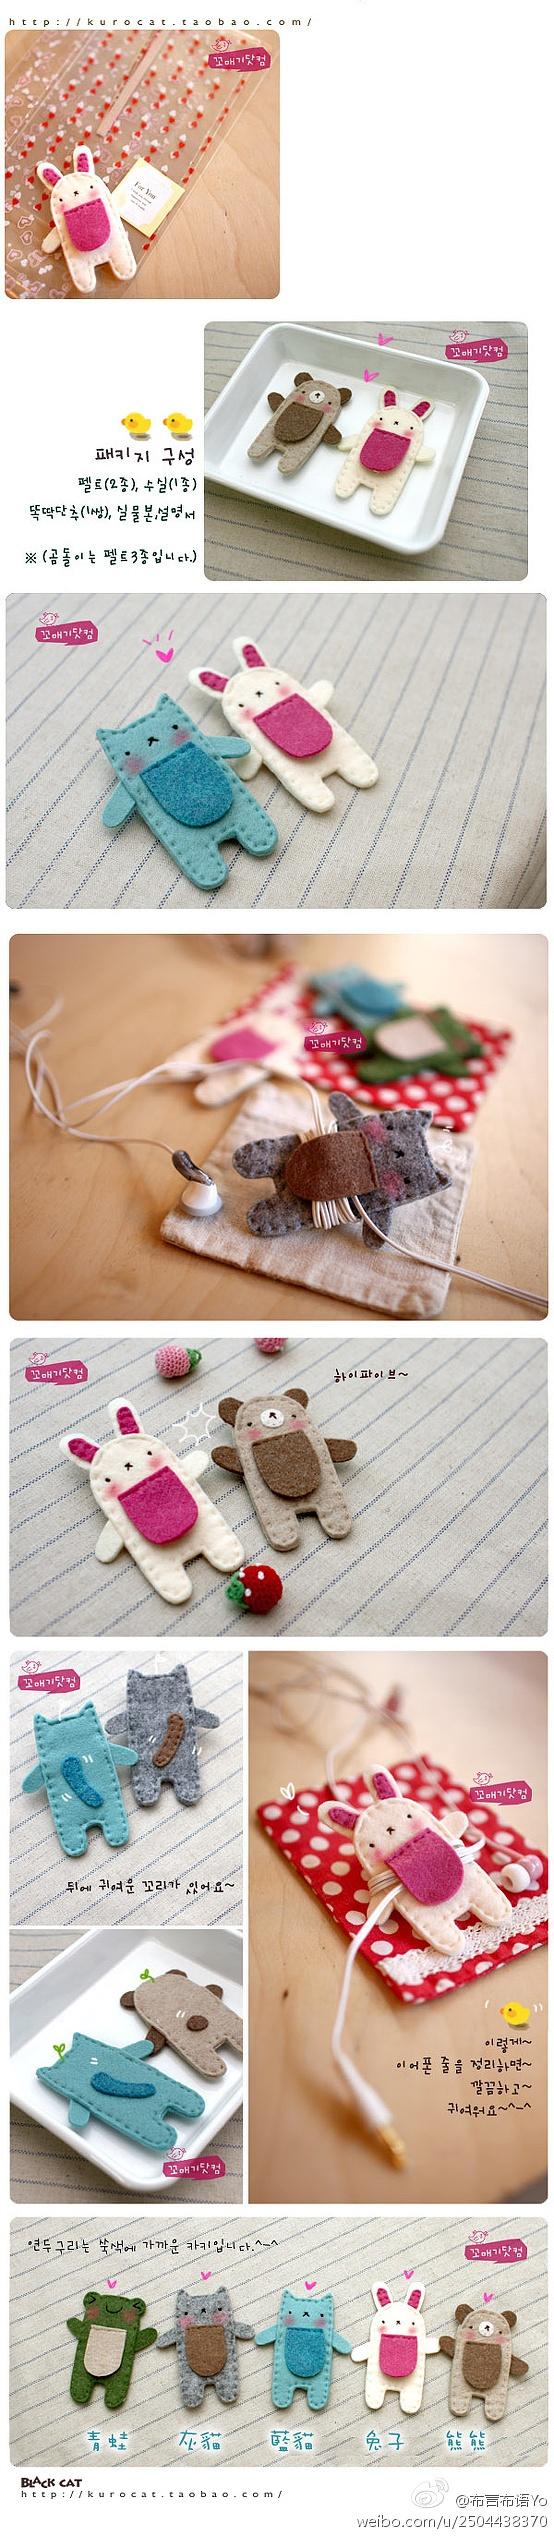 Cute little felt animals - can hold headphone cords